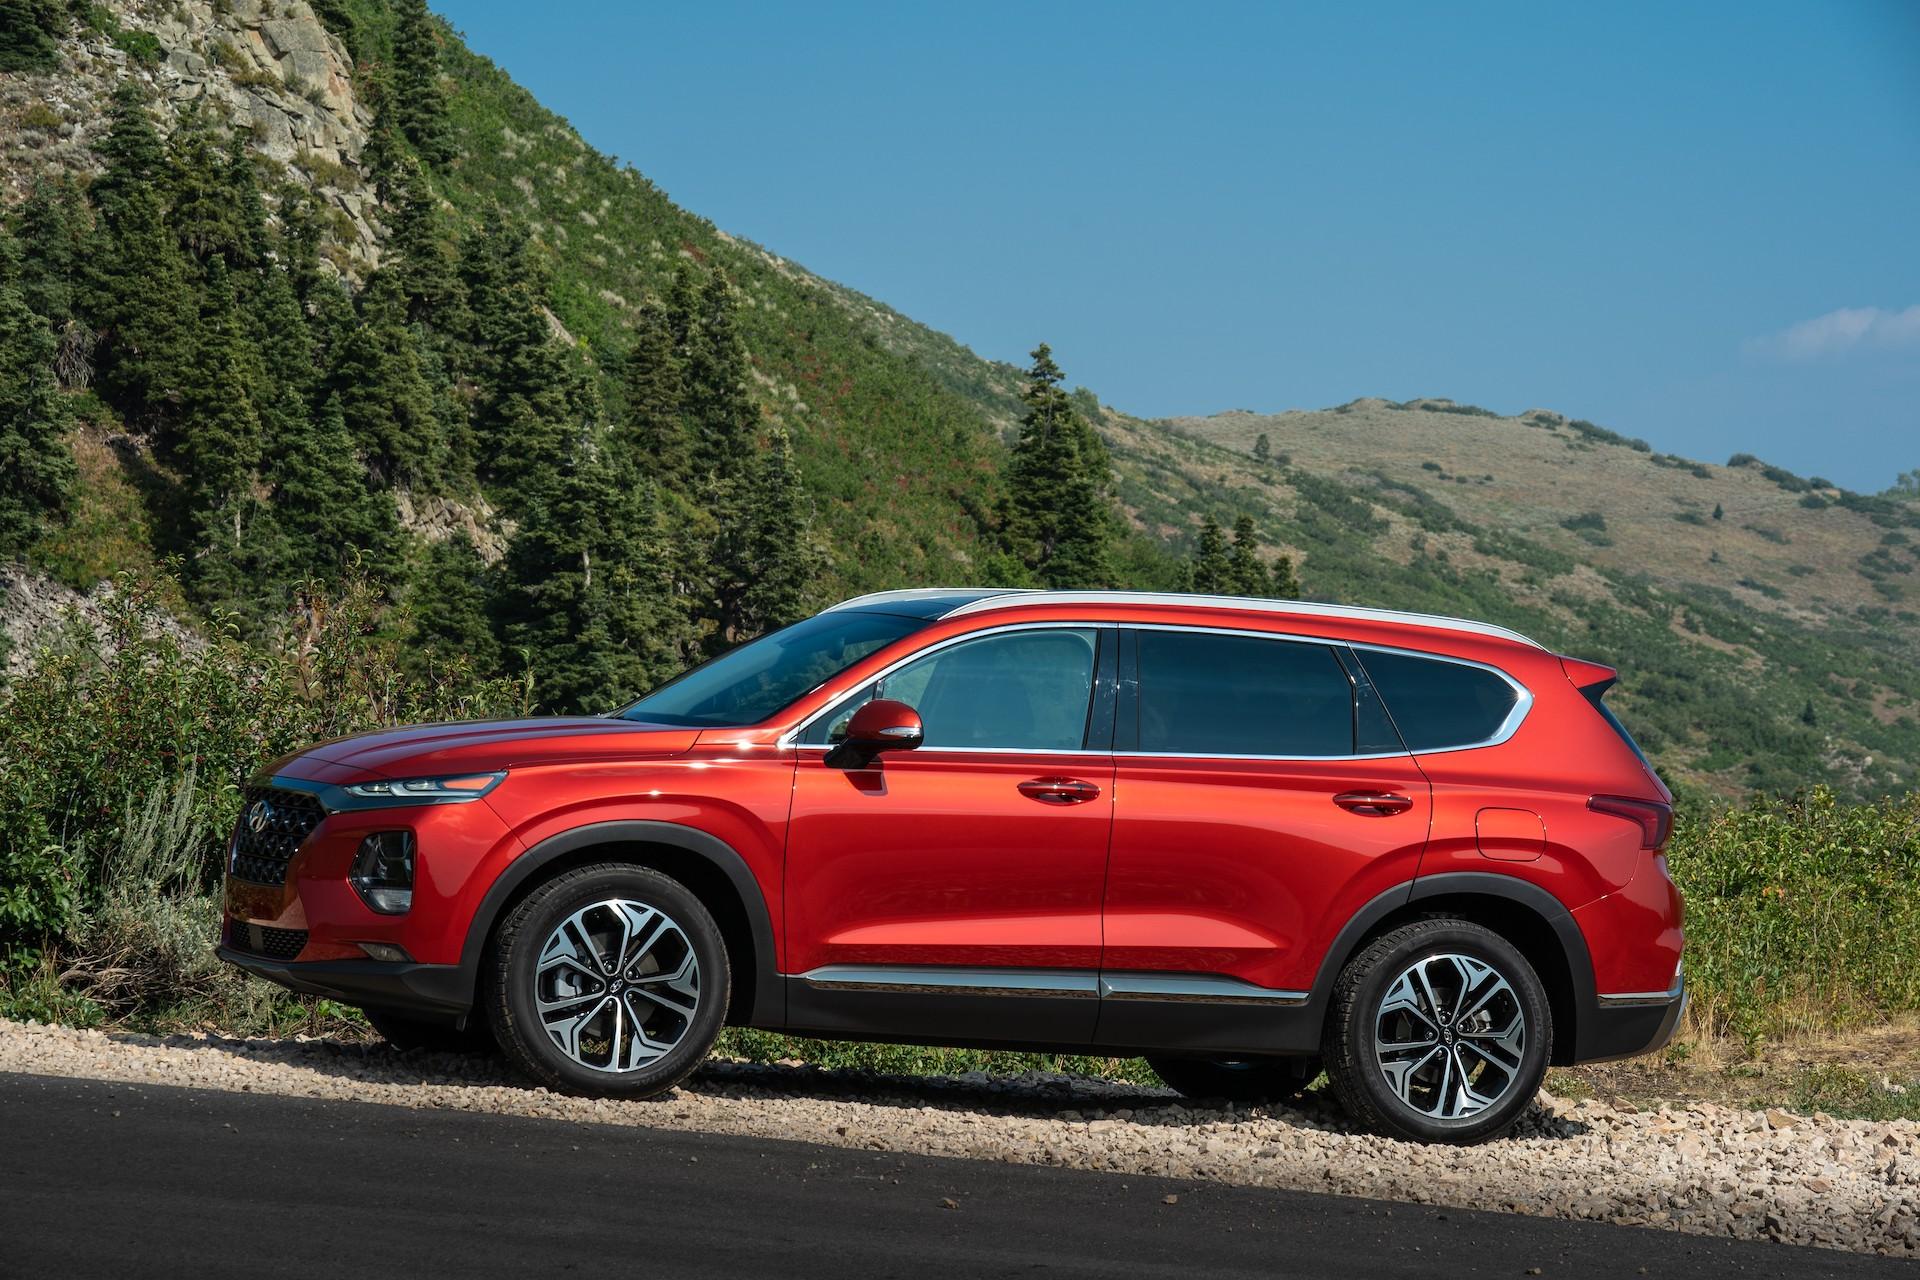 2020 Hyundai Santa Fe Vs 2020 Hyundai Tucson Compare Crossovers